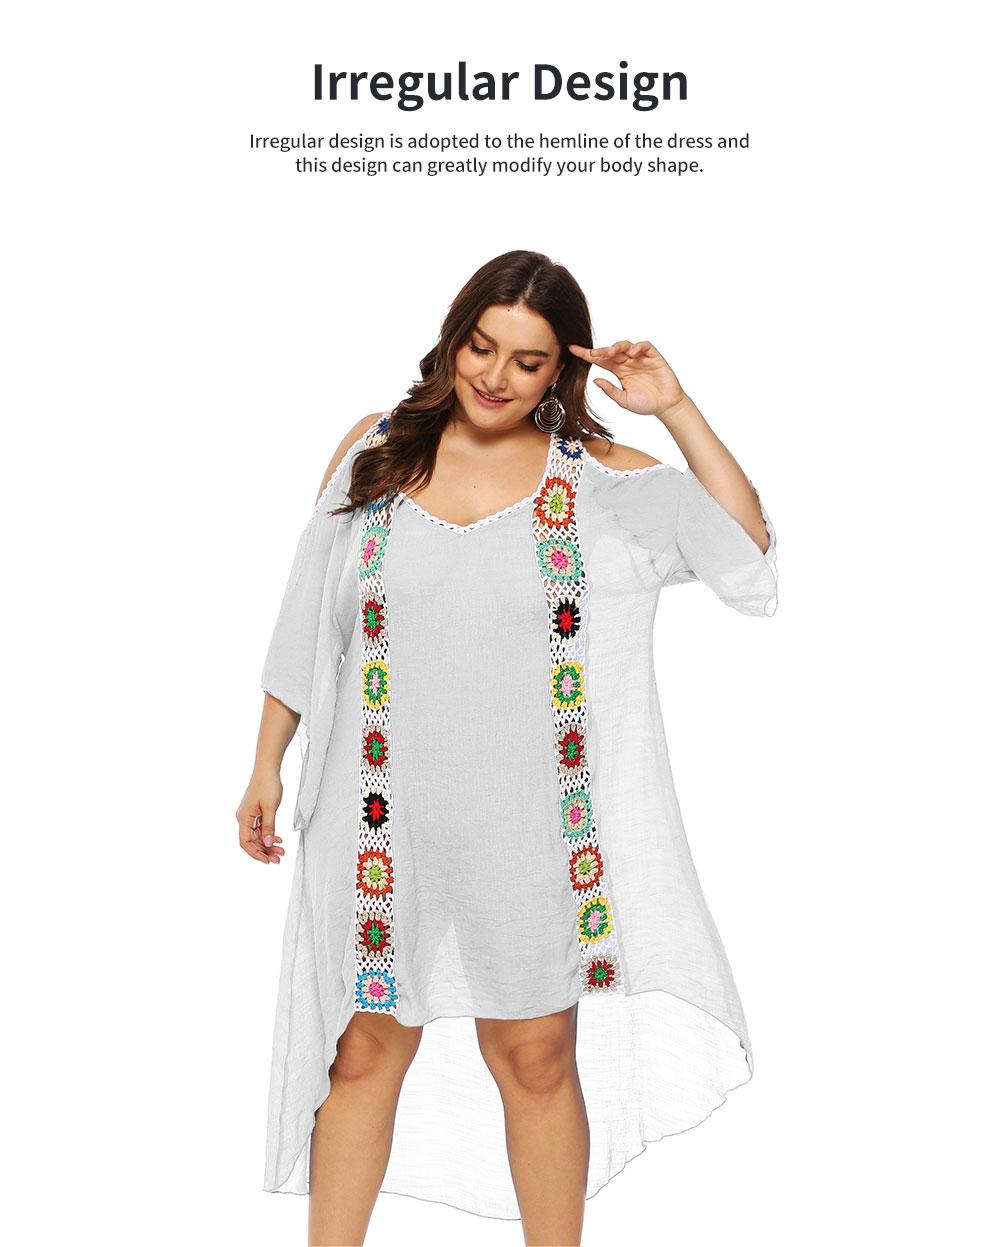 Minimalist Elegant Large Size Off-the-Shoulder Irregular Joint Dress Soft Slub Cotton Bikini Smock Beach Long Dress 3